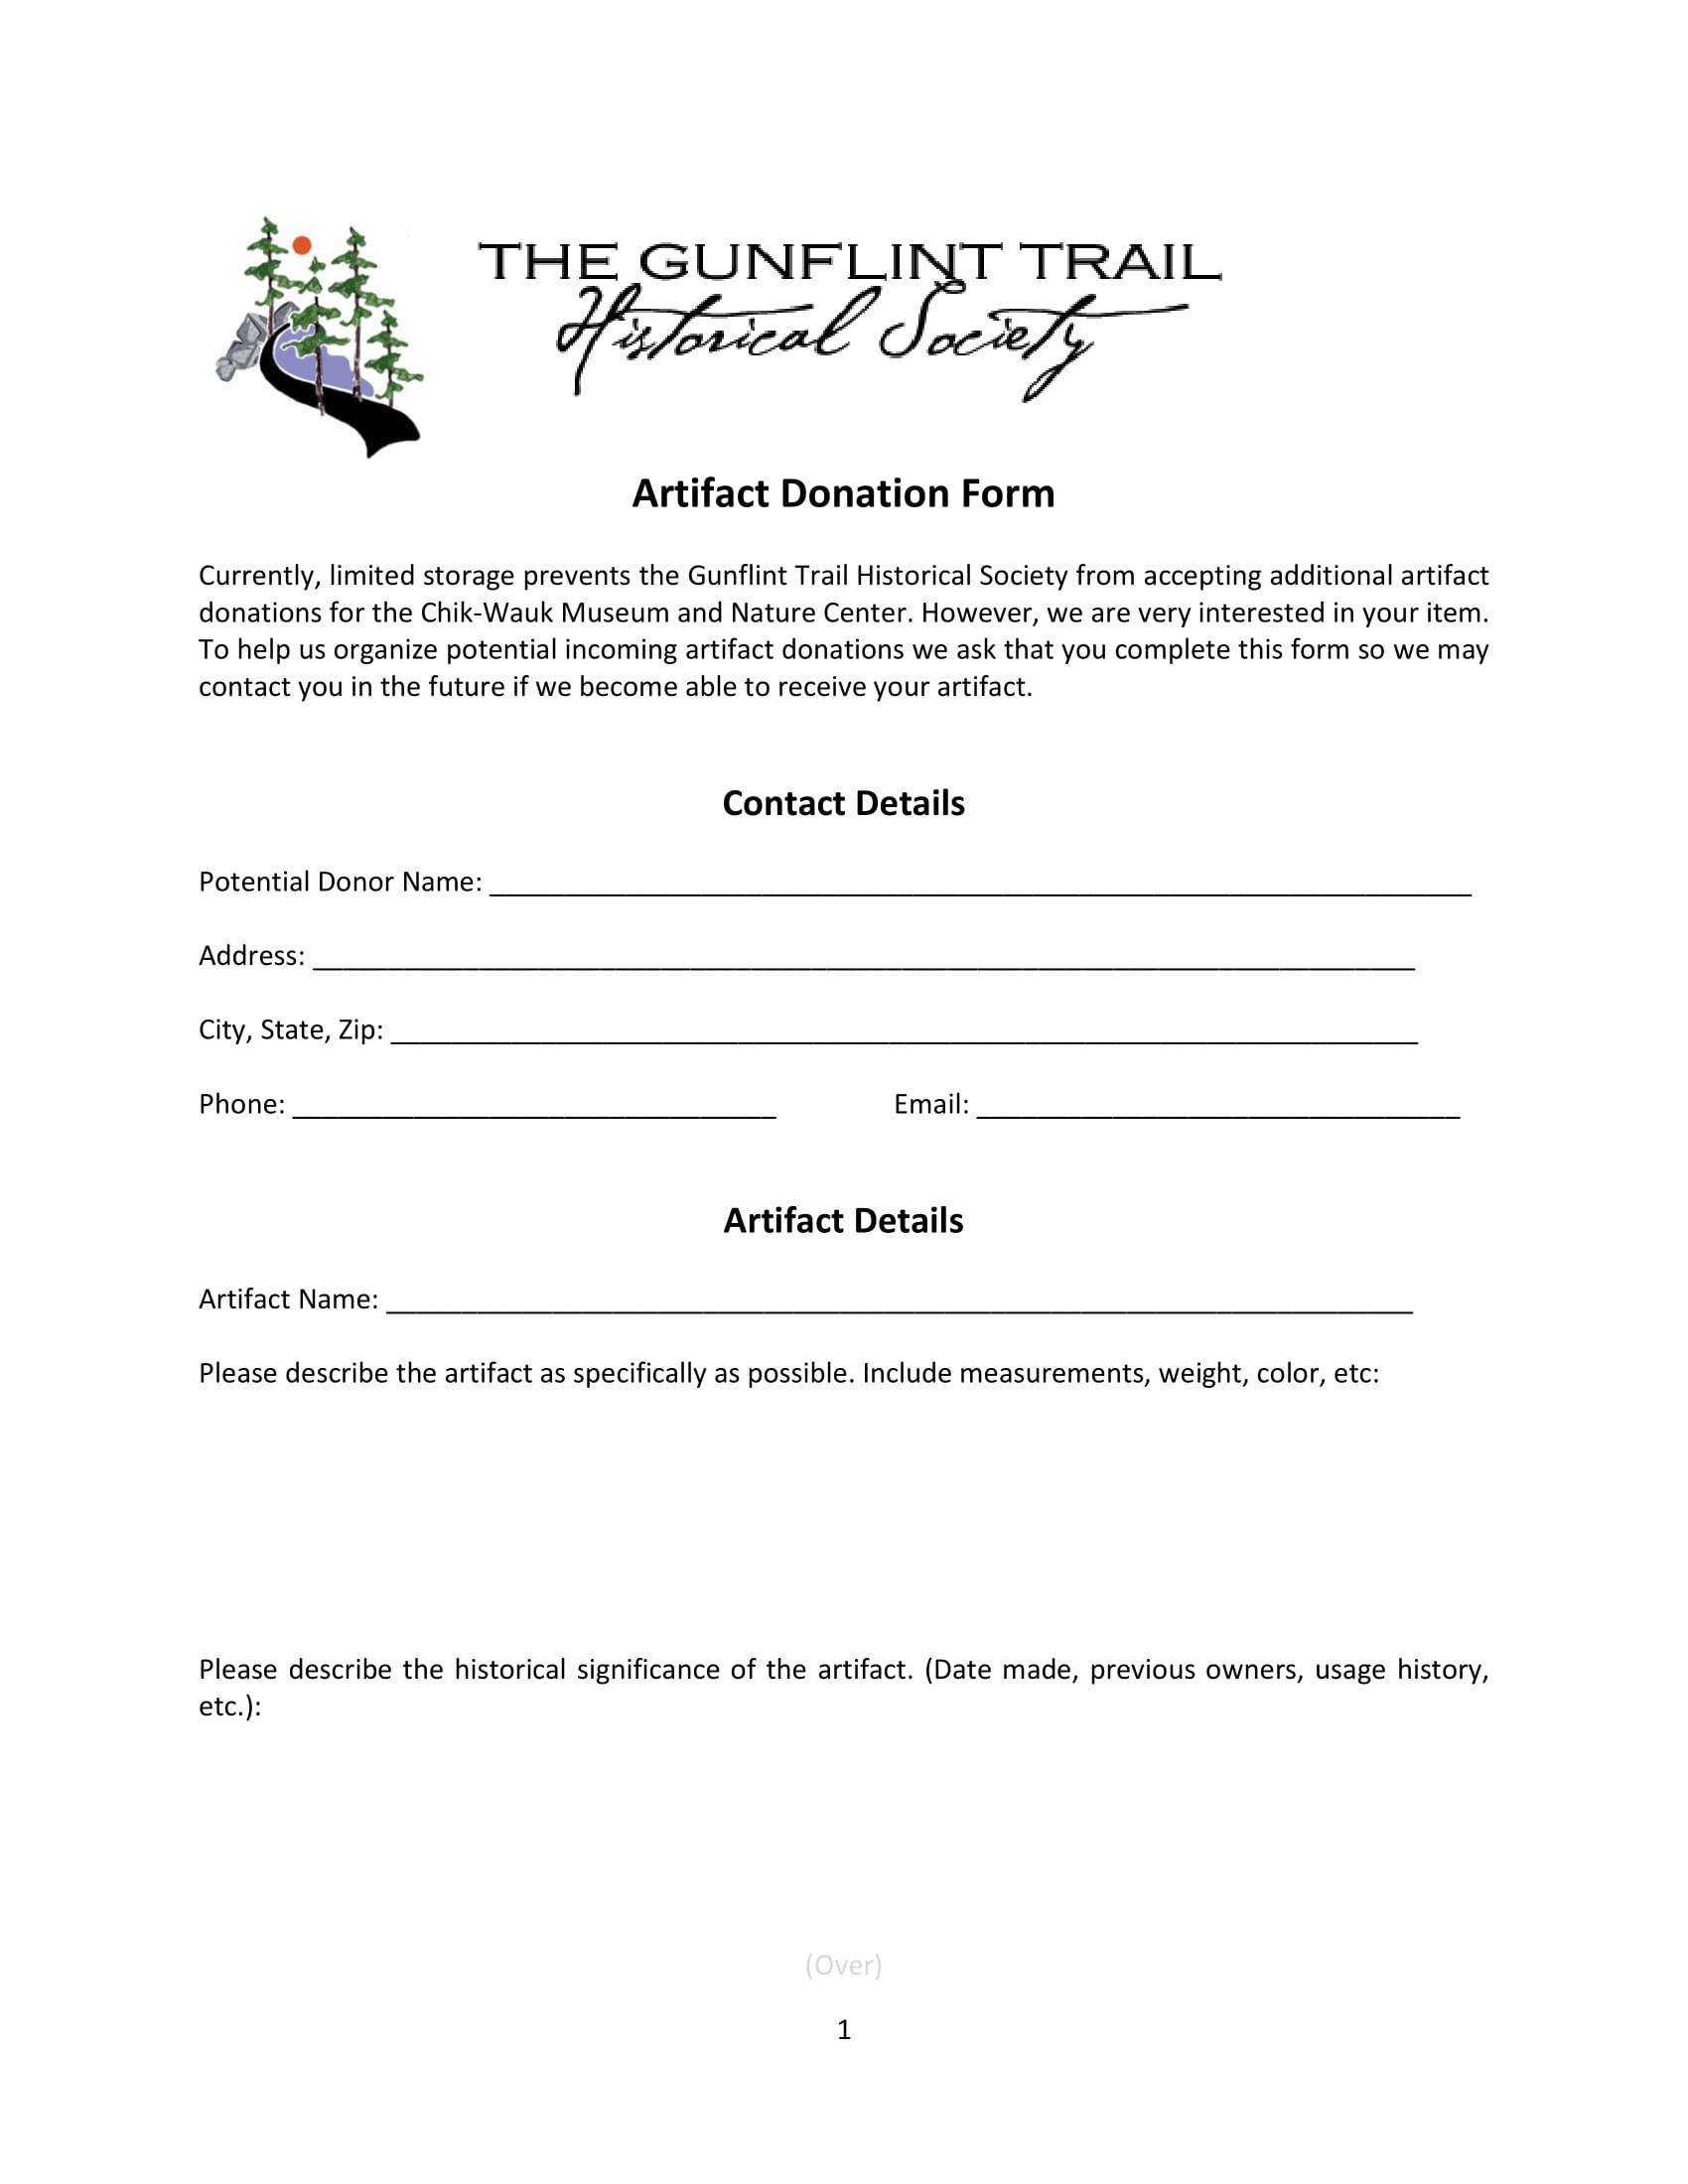 artifact donation form 1